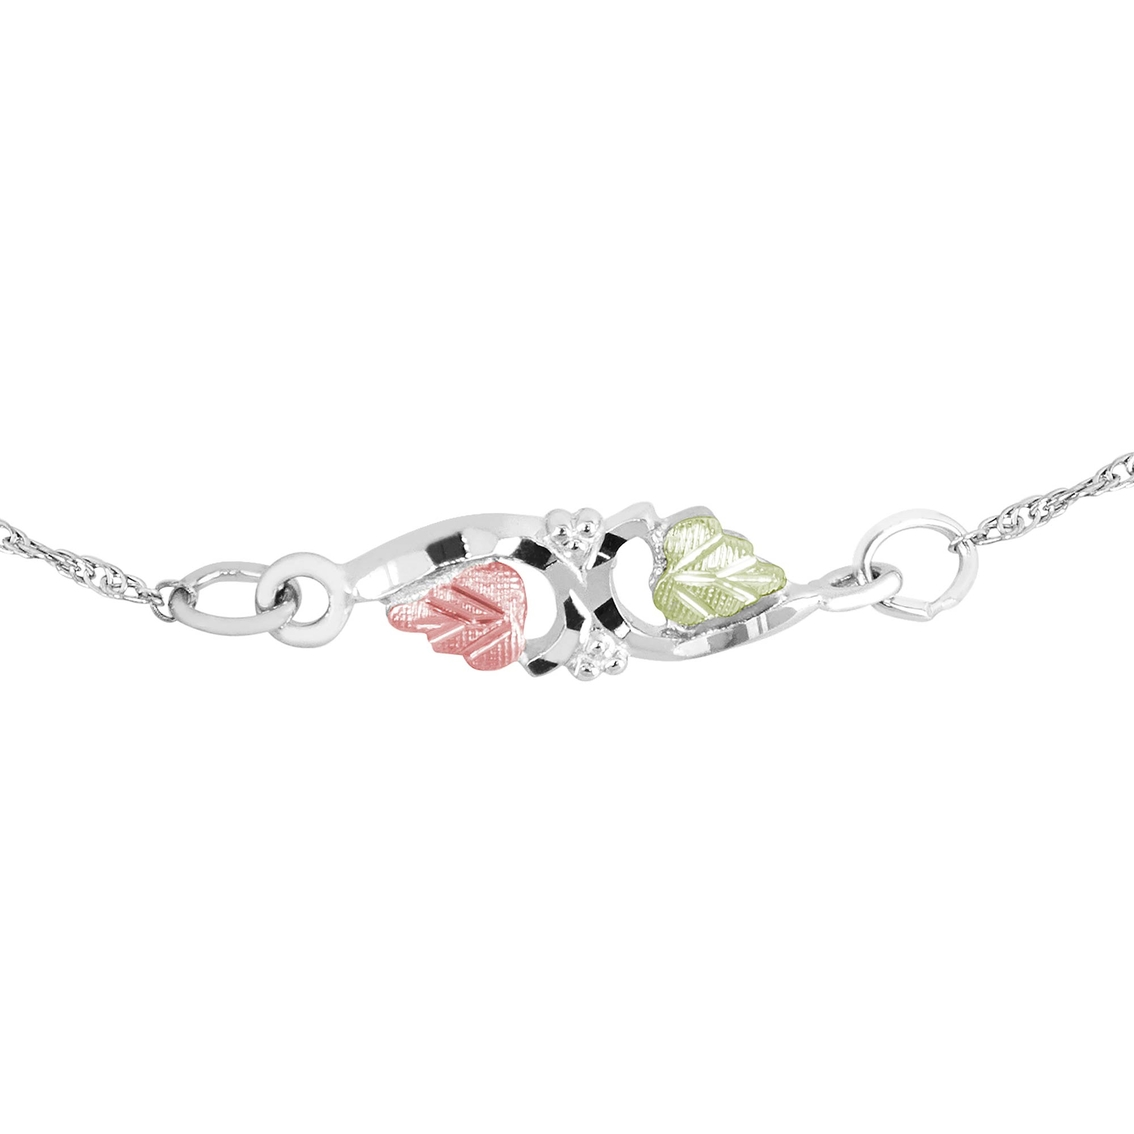 DiamondJewelryNY Double Loop Bangle Bracelet with a Chalice Charm.